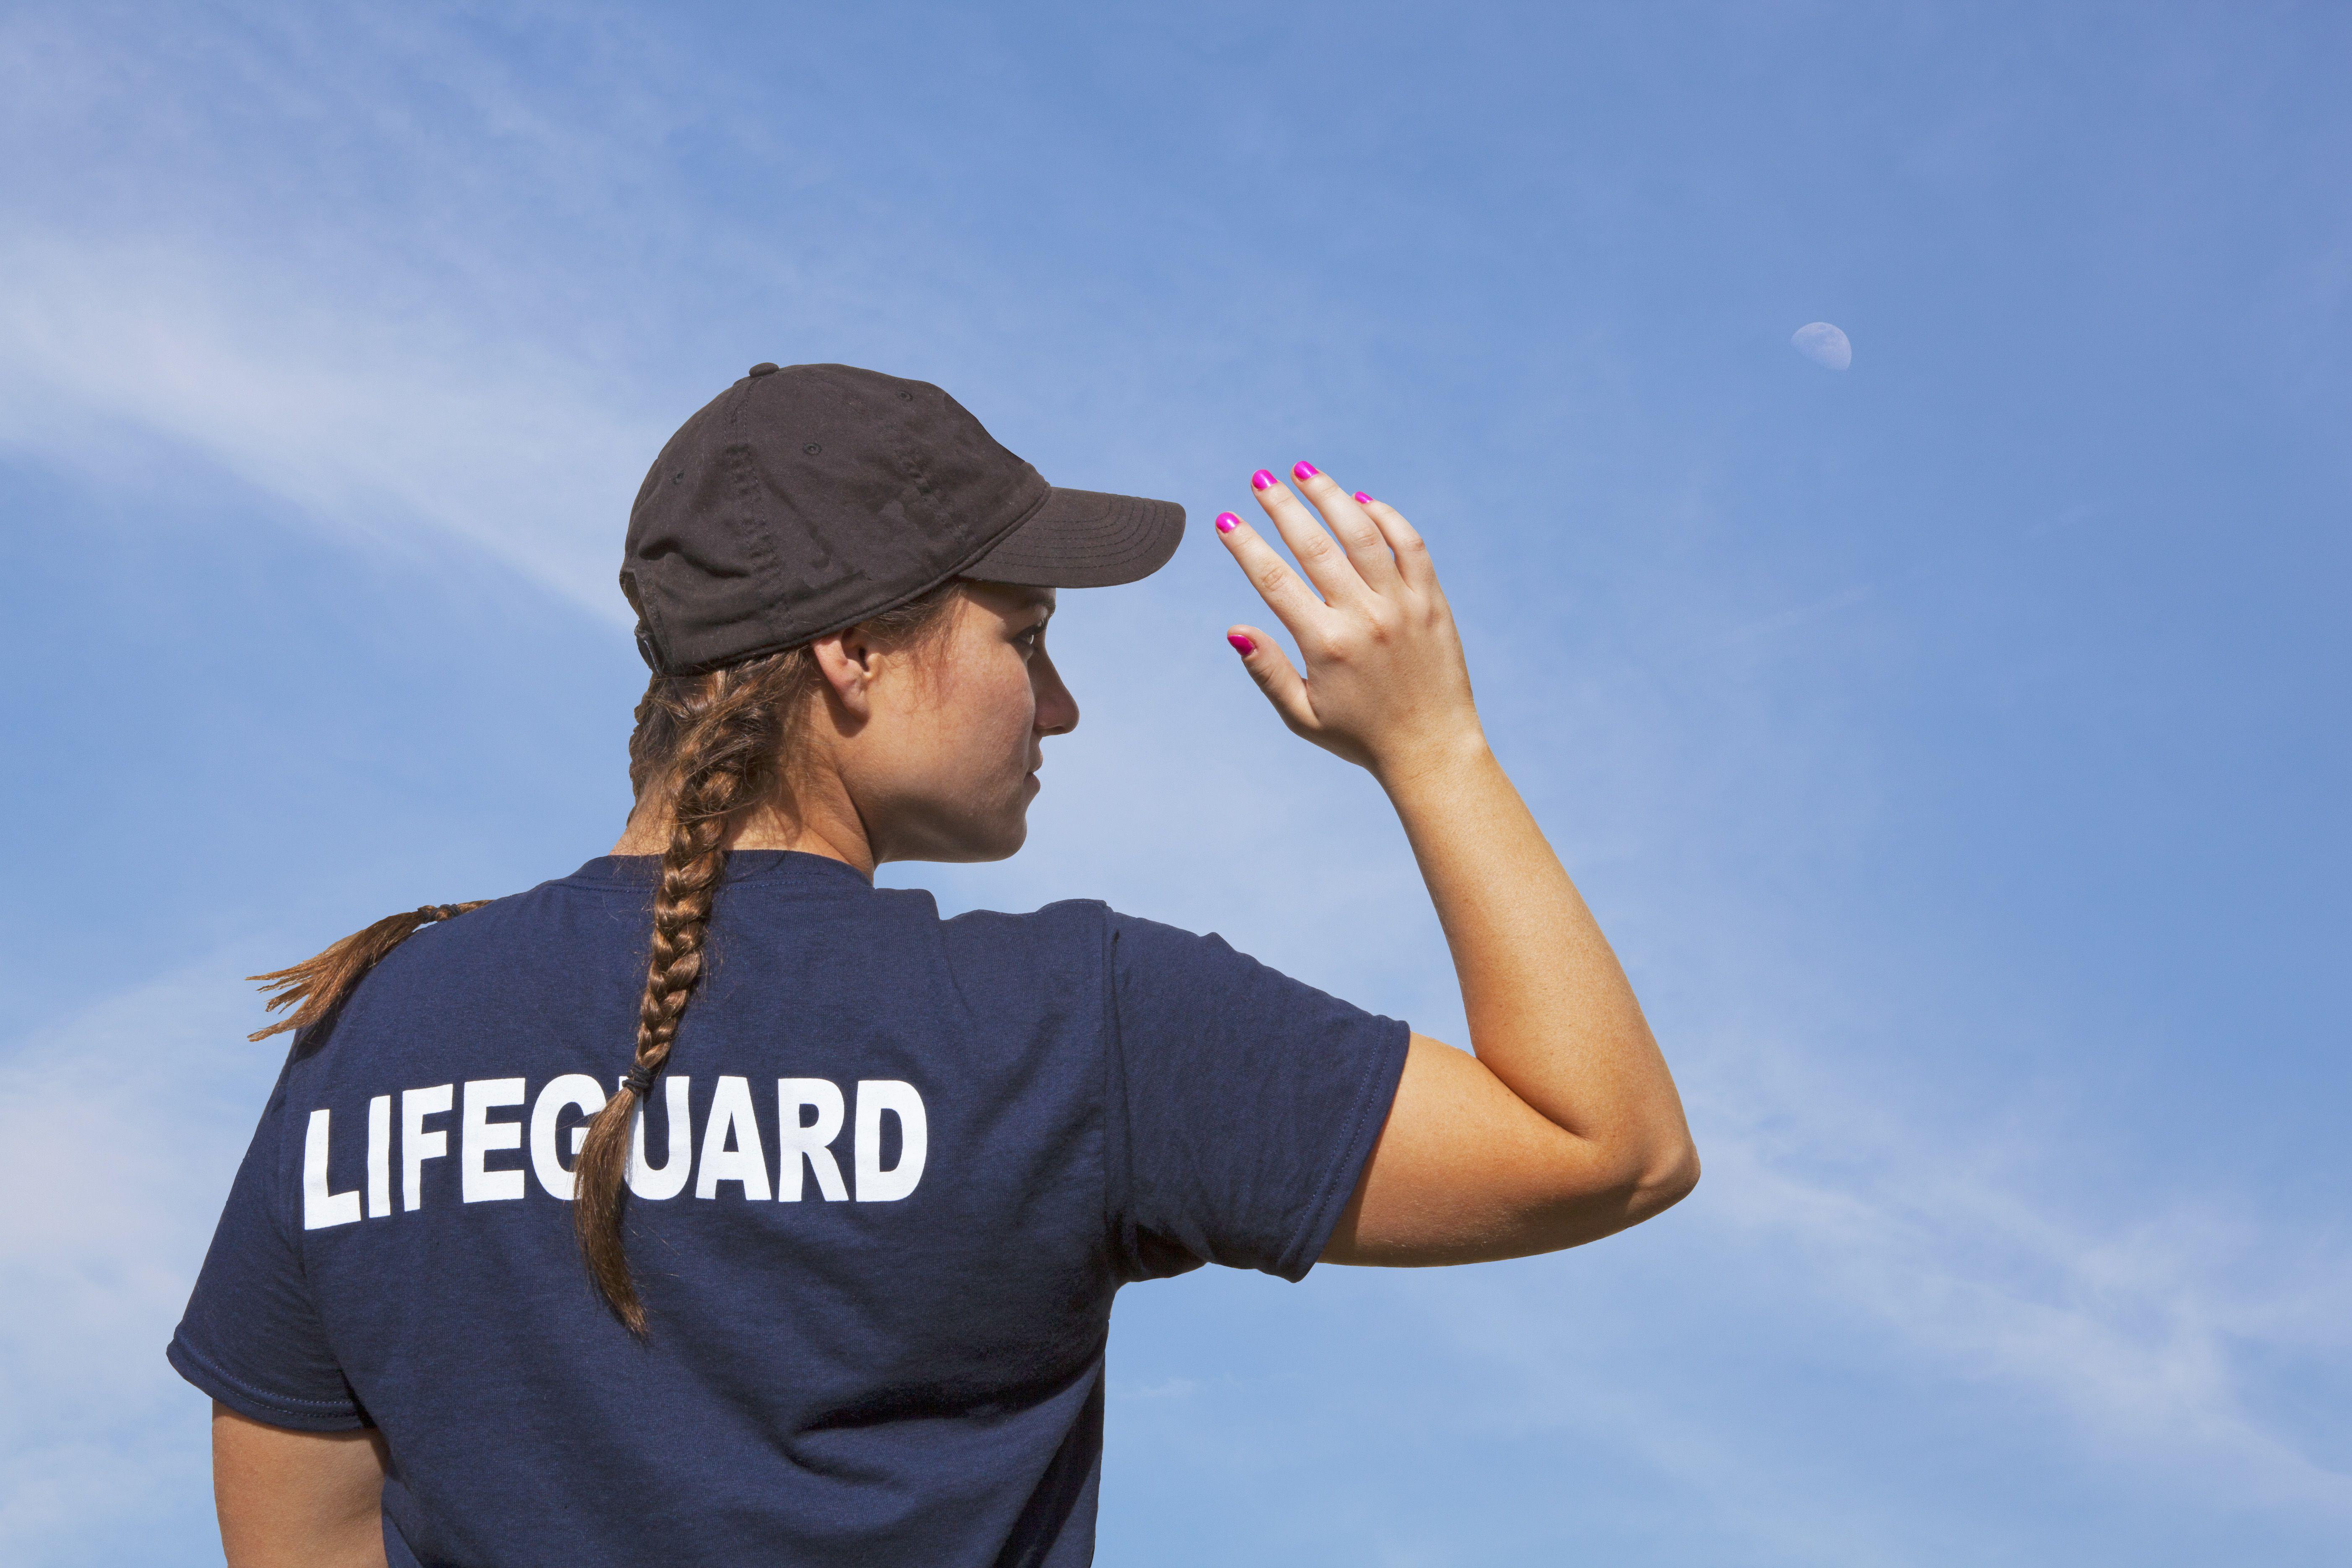 Lifeguard Girl On Duty Under a Blue Sky